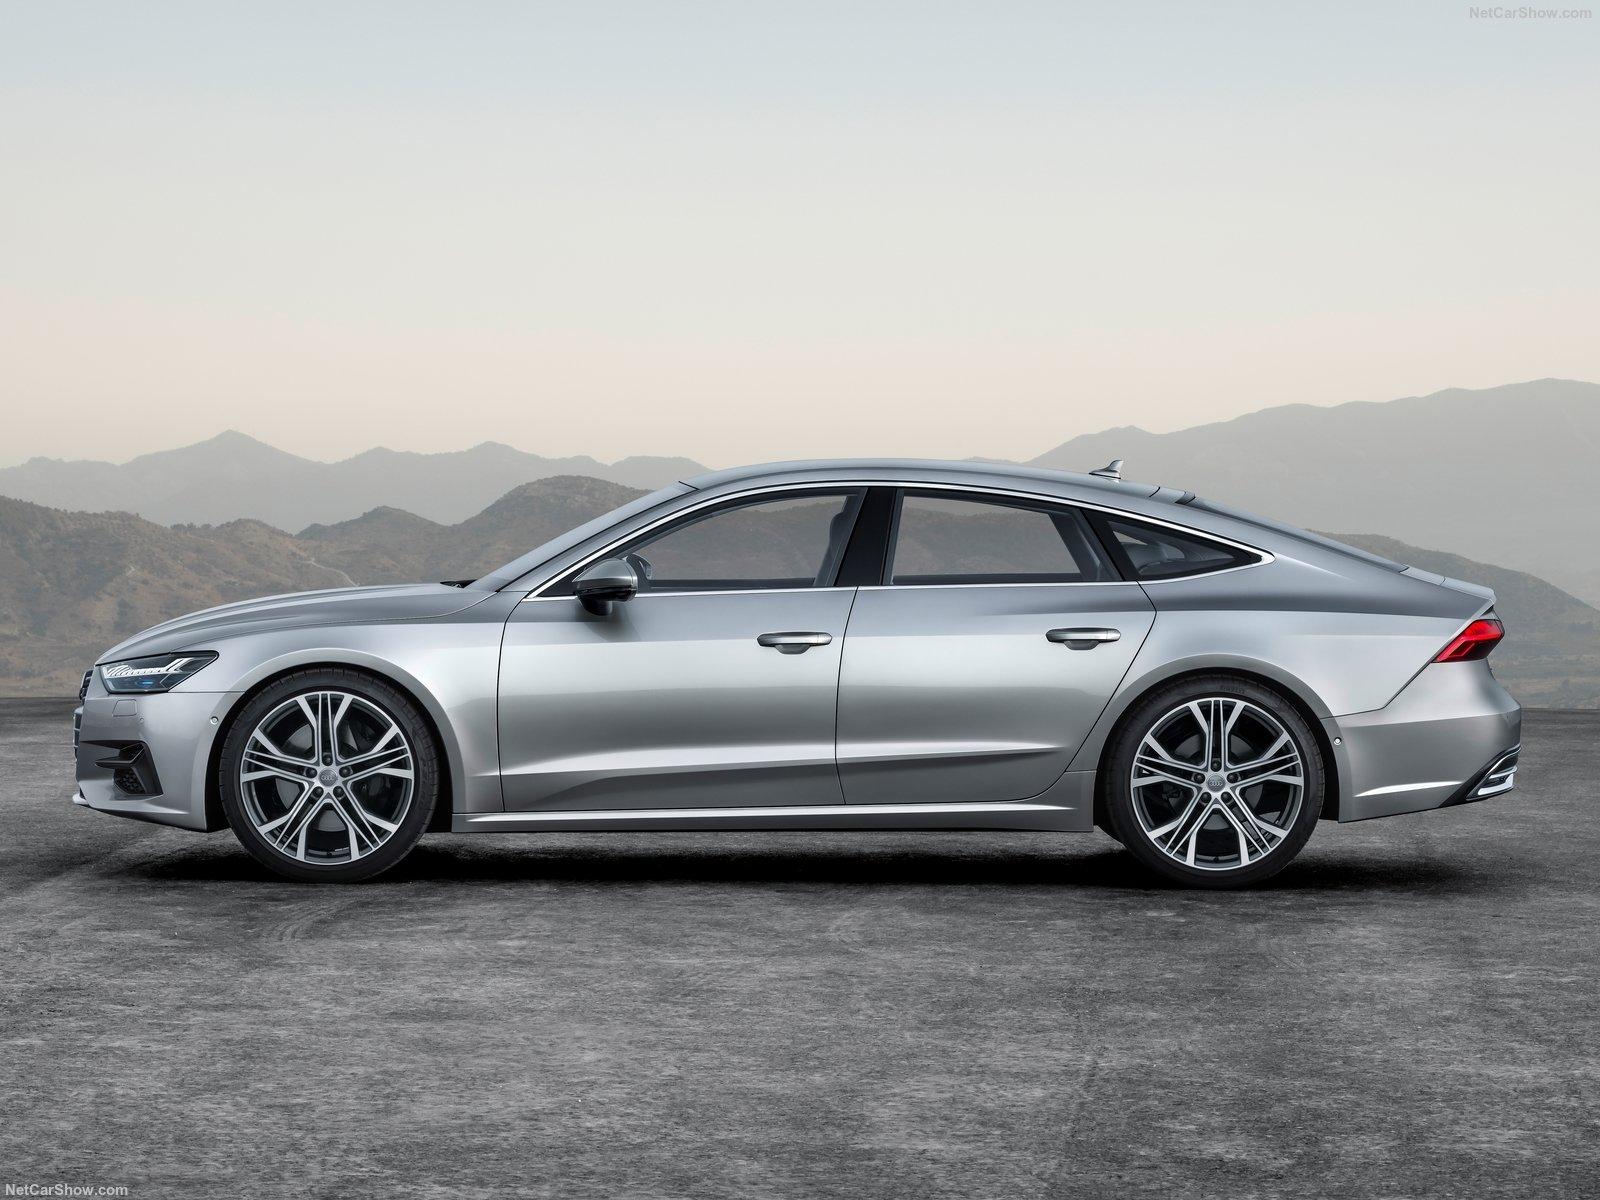 2017 - [Audi] A7 Sportback II - Page 6 Audi-a22